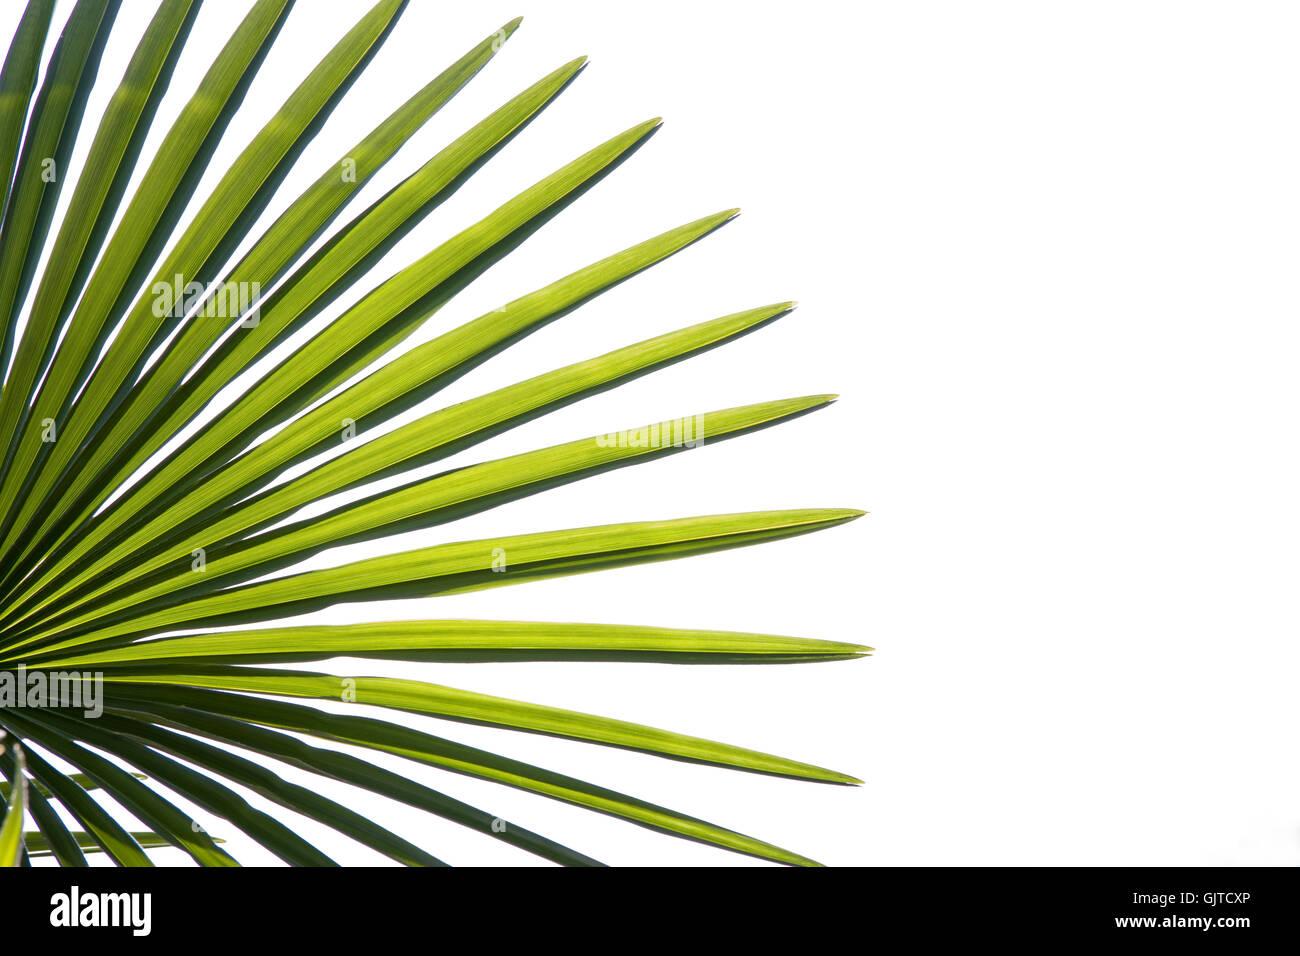 detail optional green - Stock Image